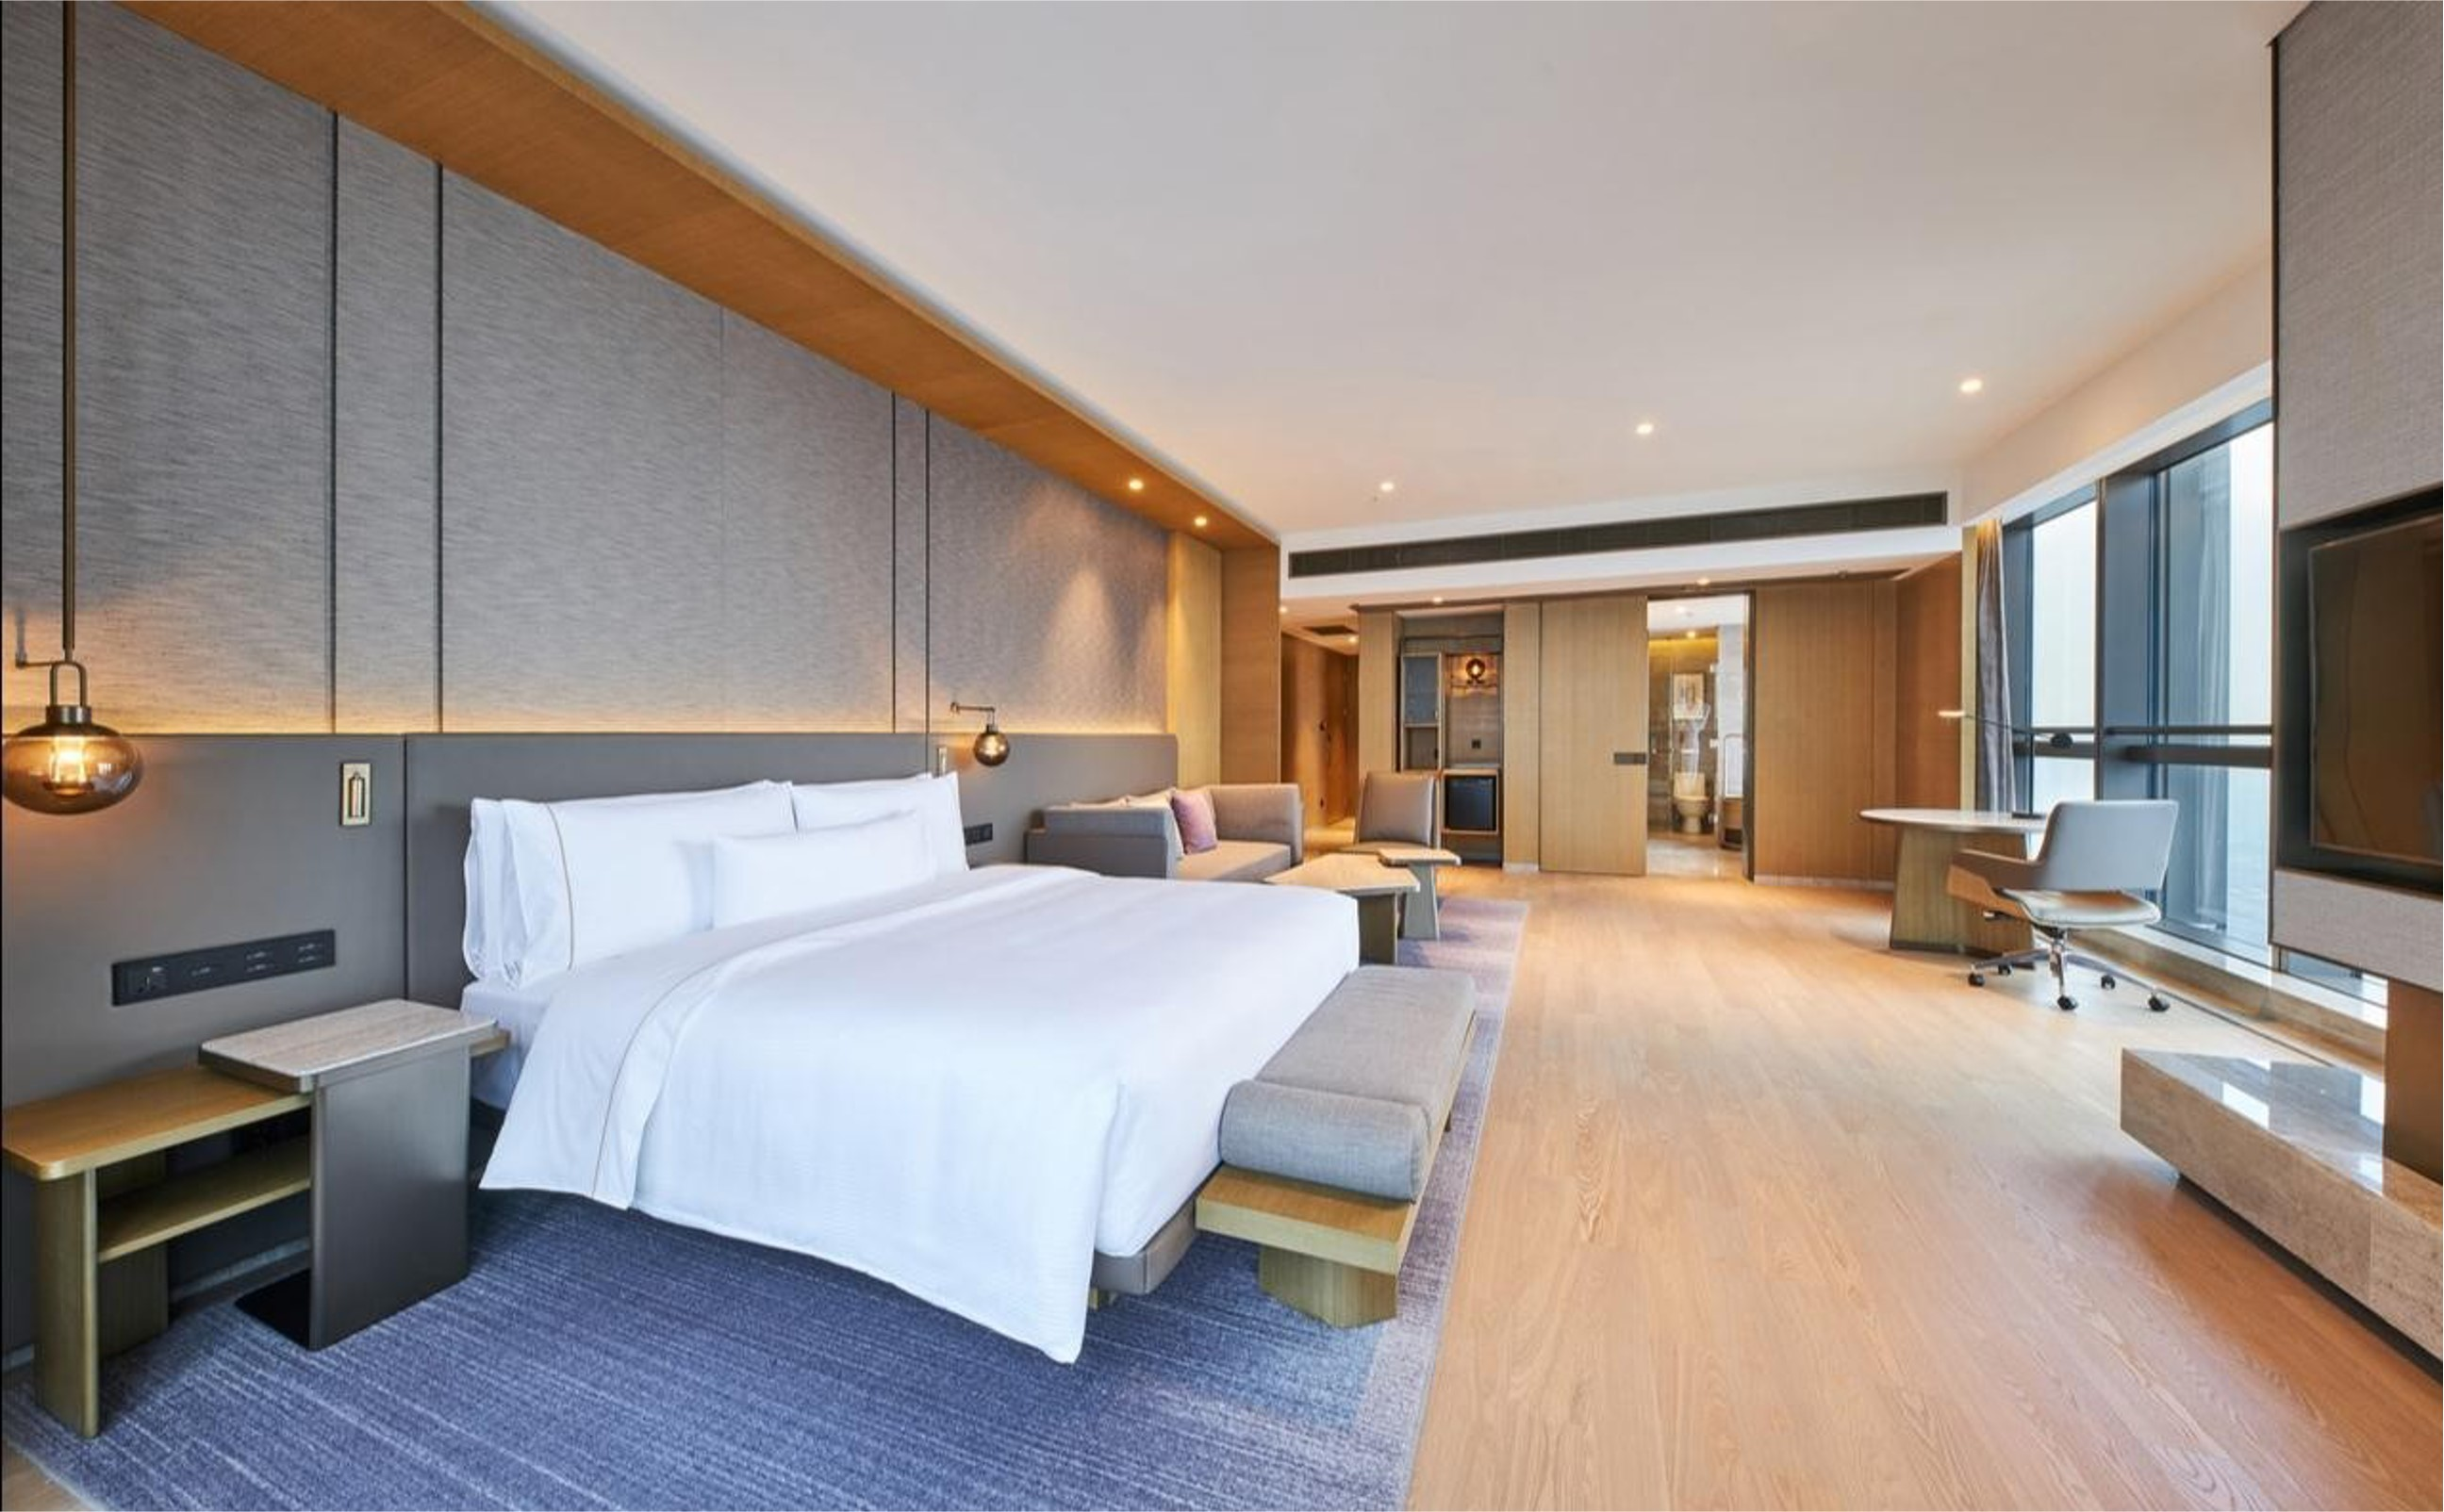 Gojo furniure Latest hotel luxury furniture manufacturers for lounge area-1